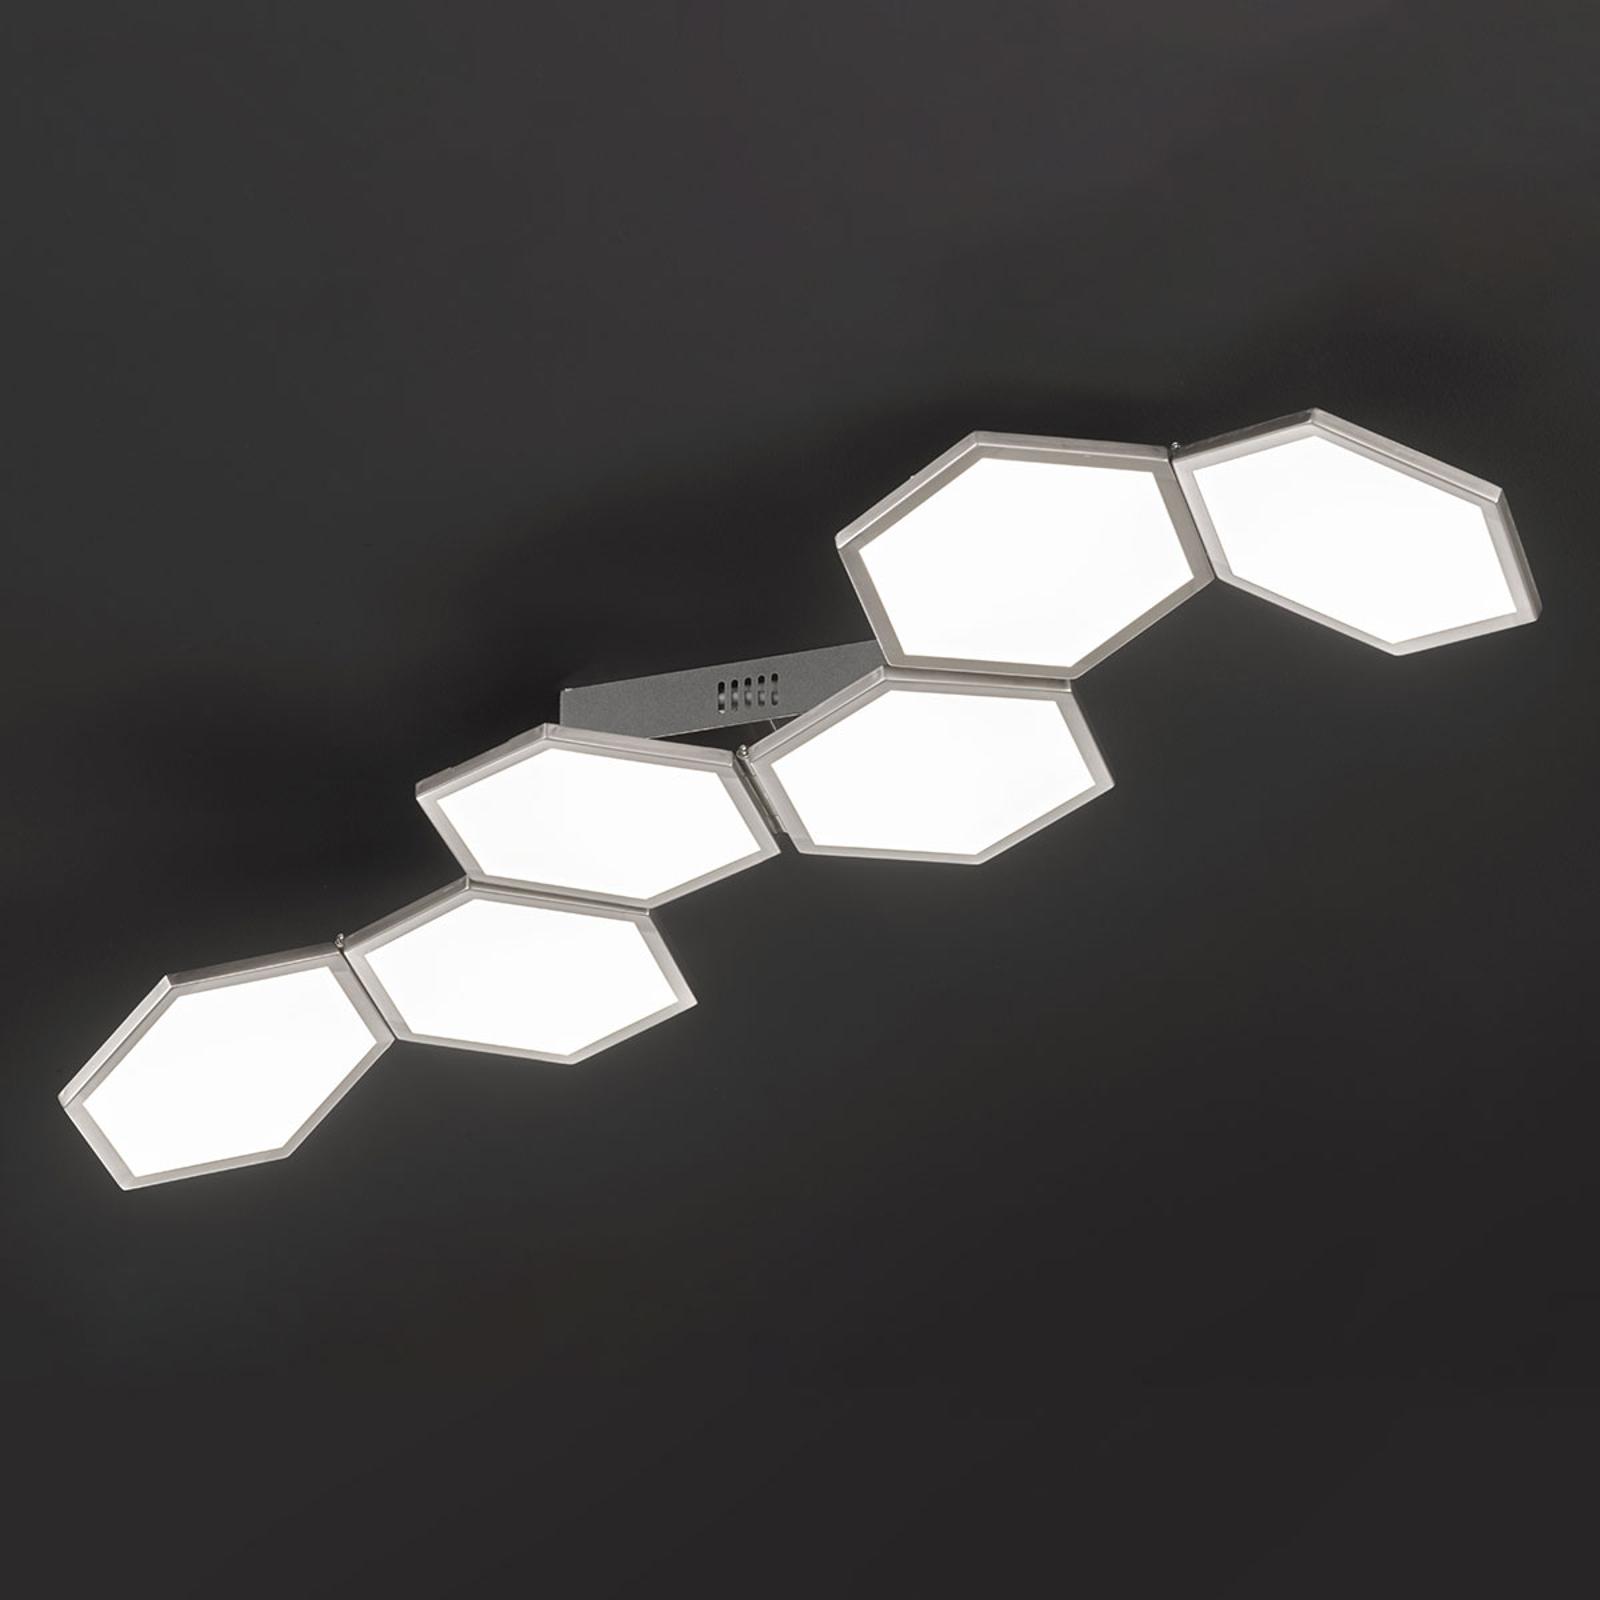 Plafonnier LED dimmable Signe, réglable